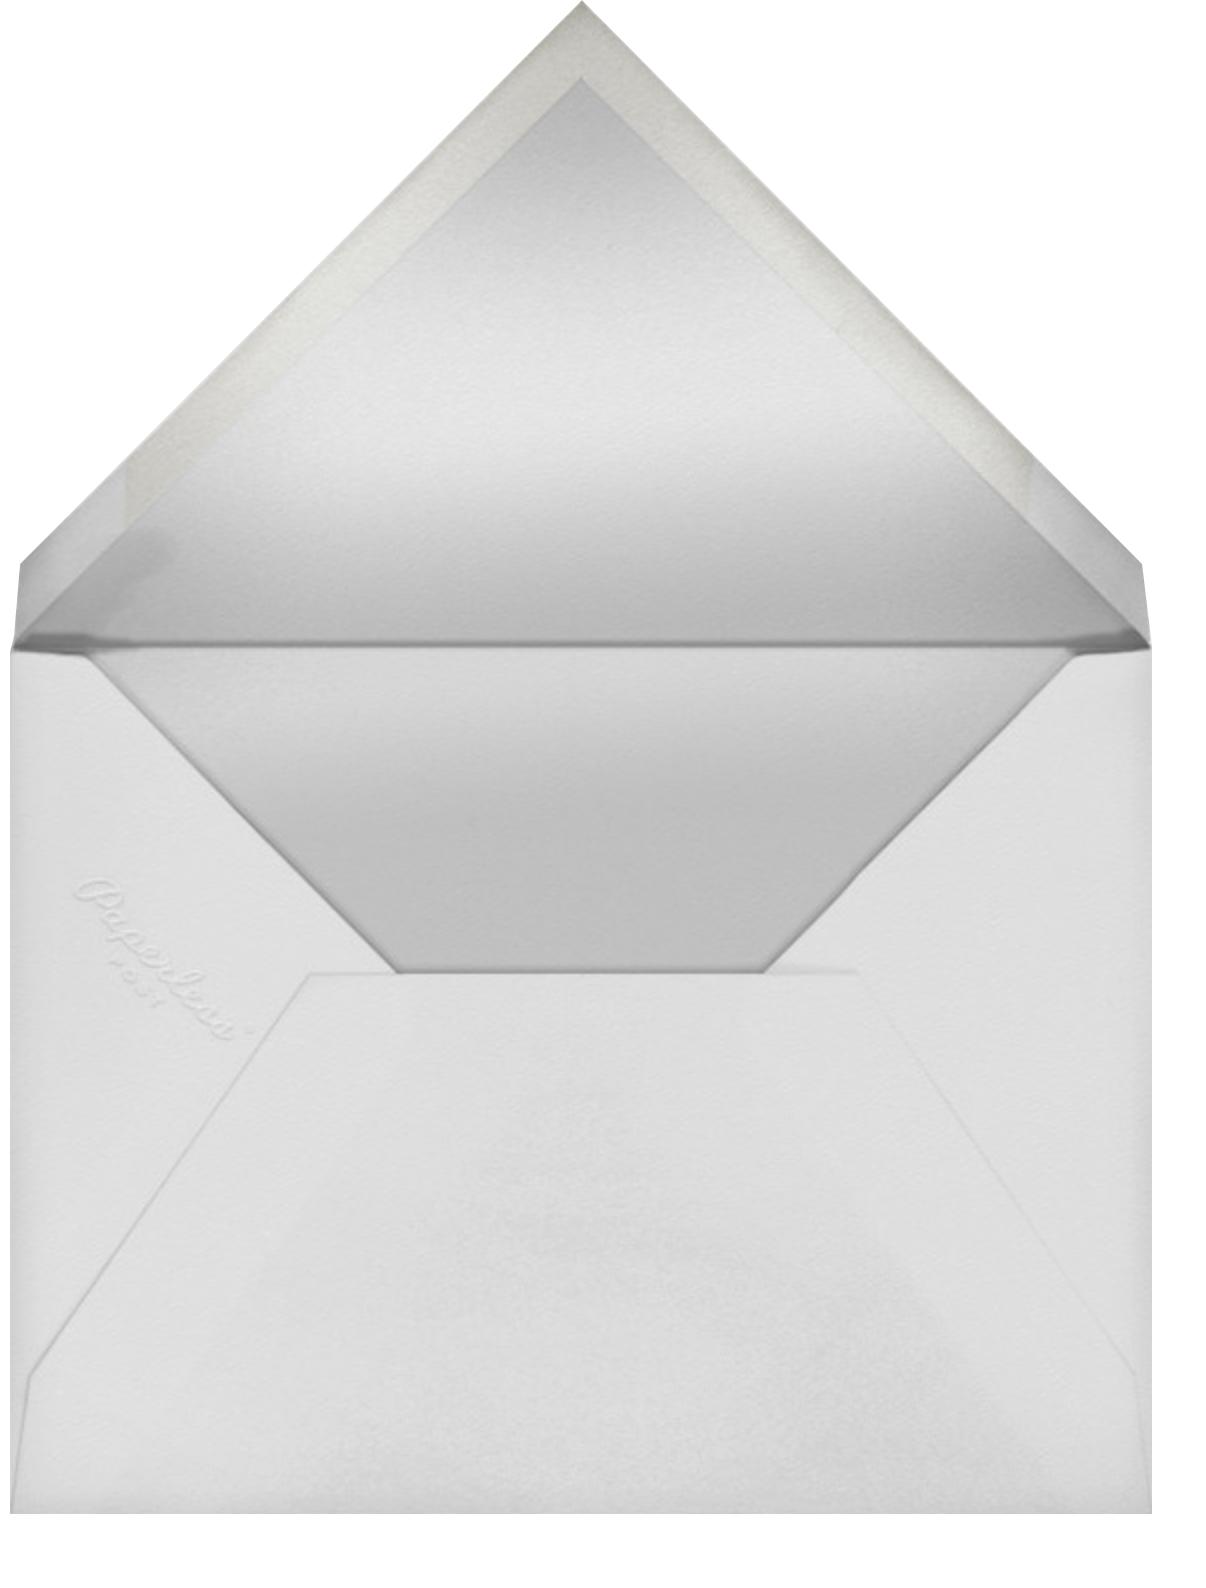 Edgerton Nursery - Newport Blue - Paperless Post - Baby shower - envelope back